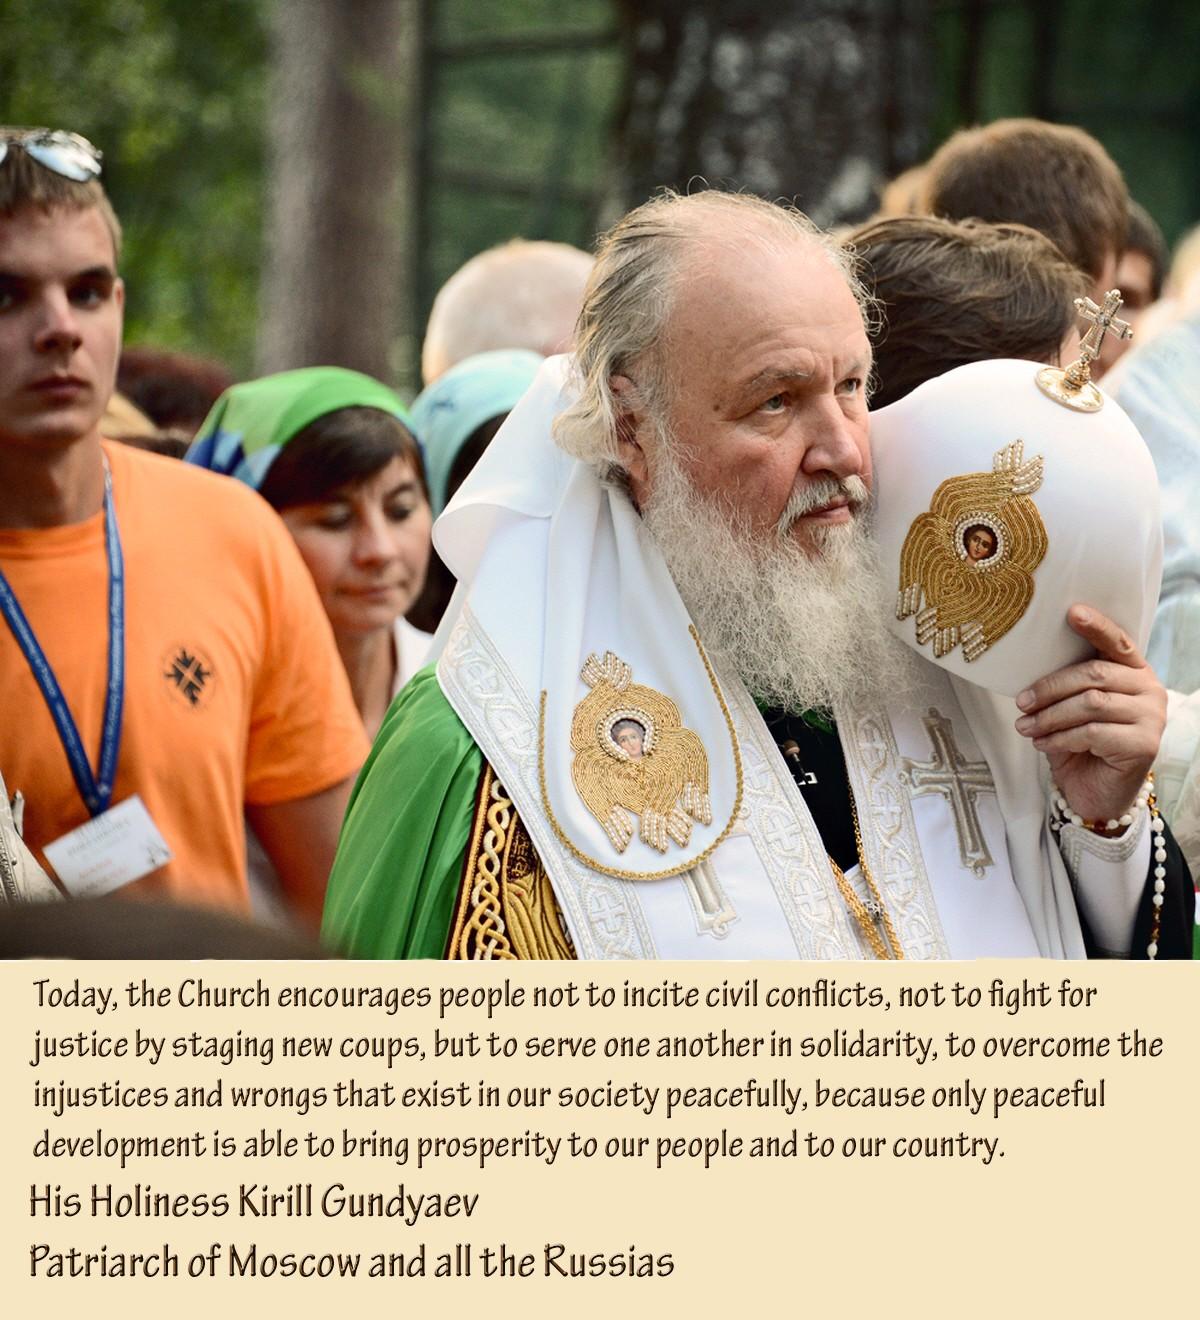 00 Patriarch Kirill. 19.08.12. Grabarka